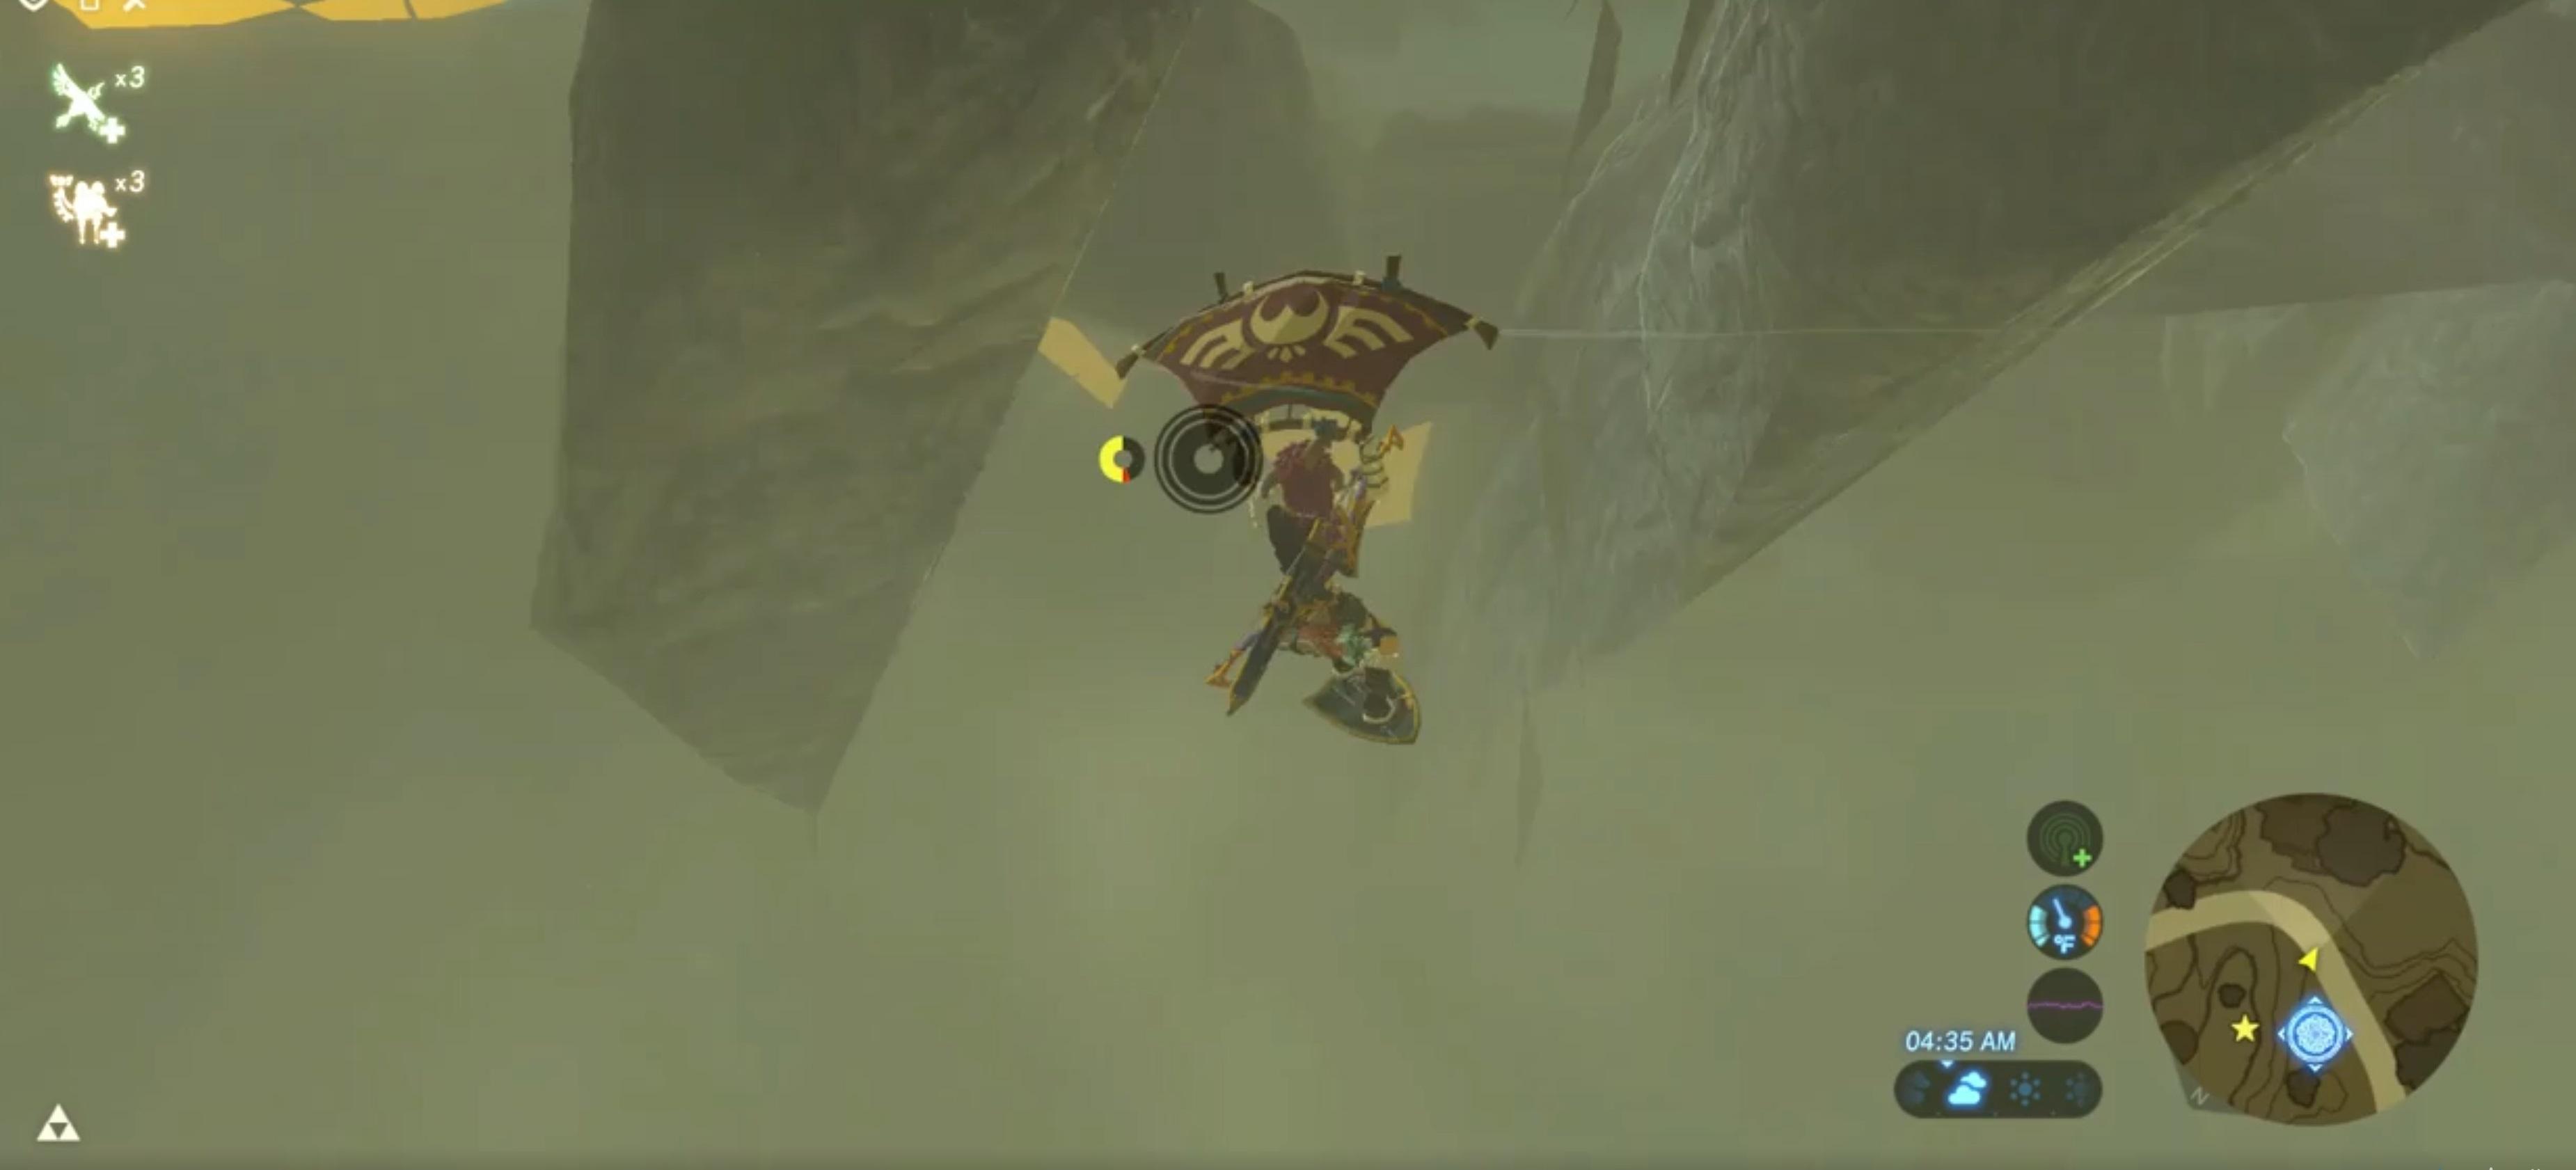 Zelda: Breath of the Wild player glitches the elusive glitched Hateno treasure chest screenshot